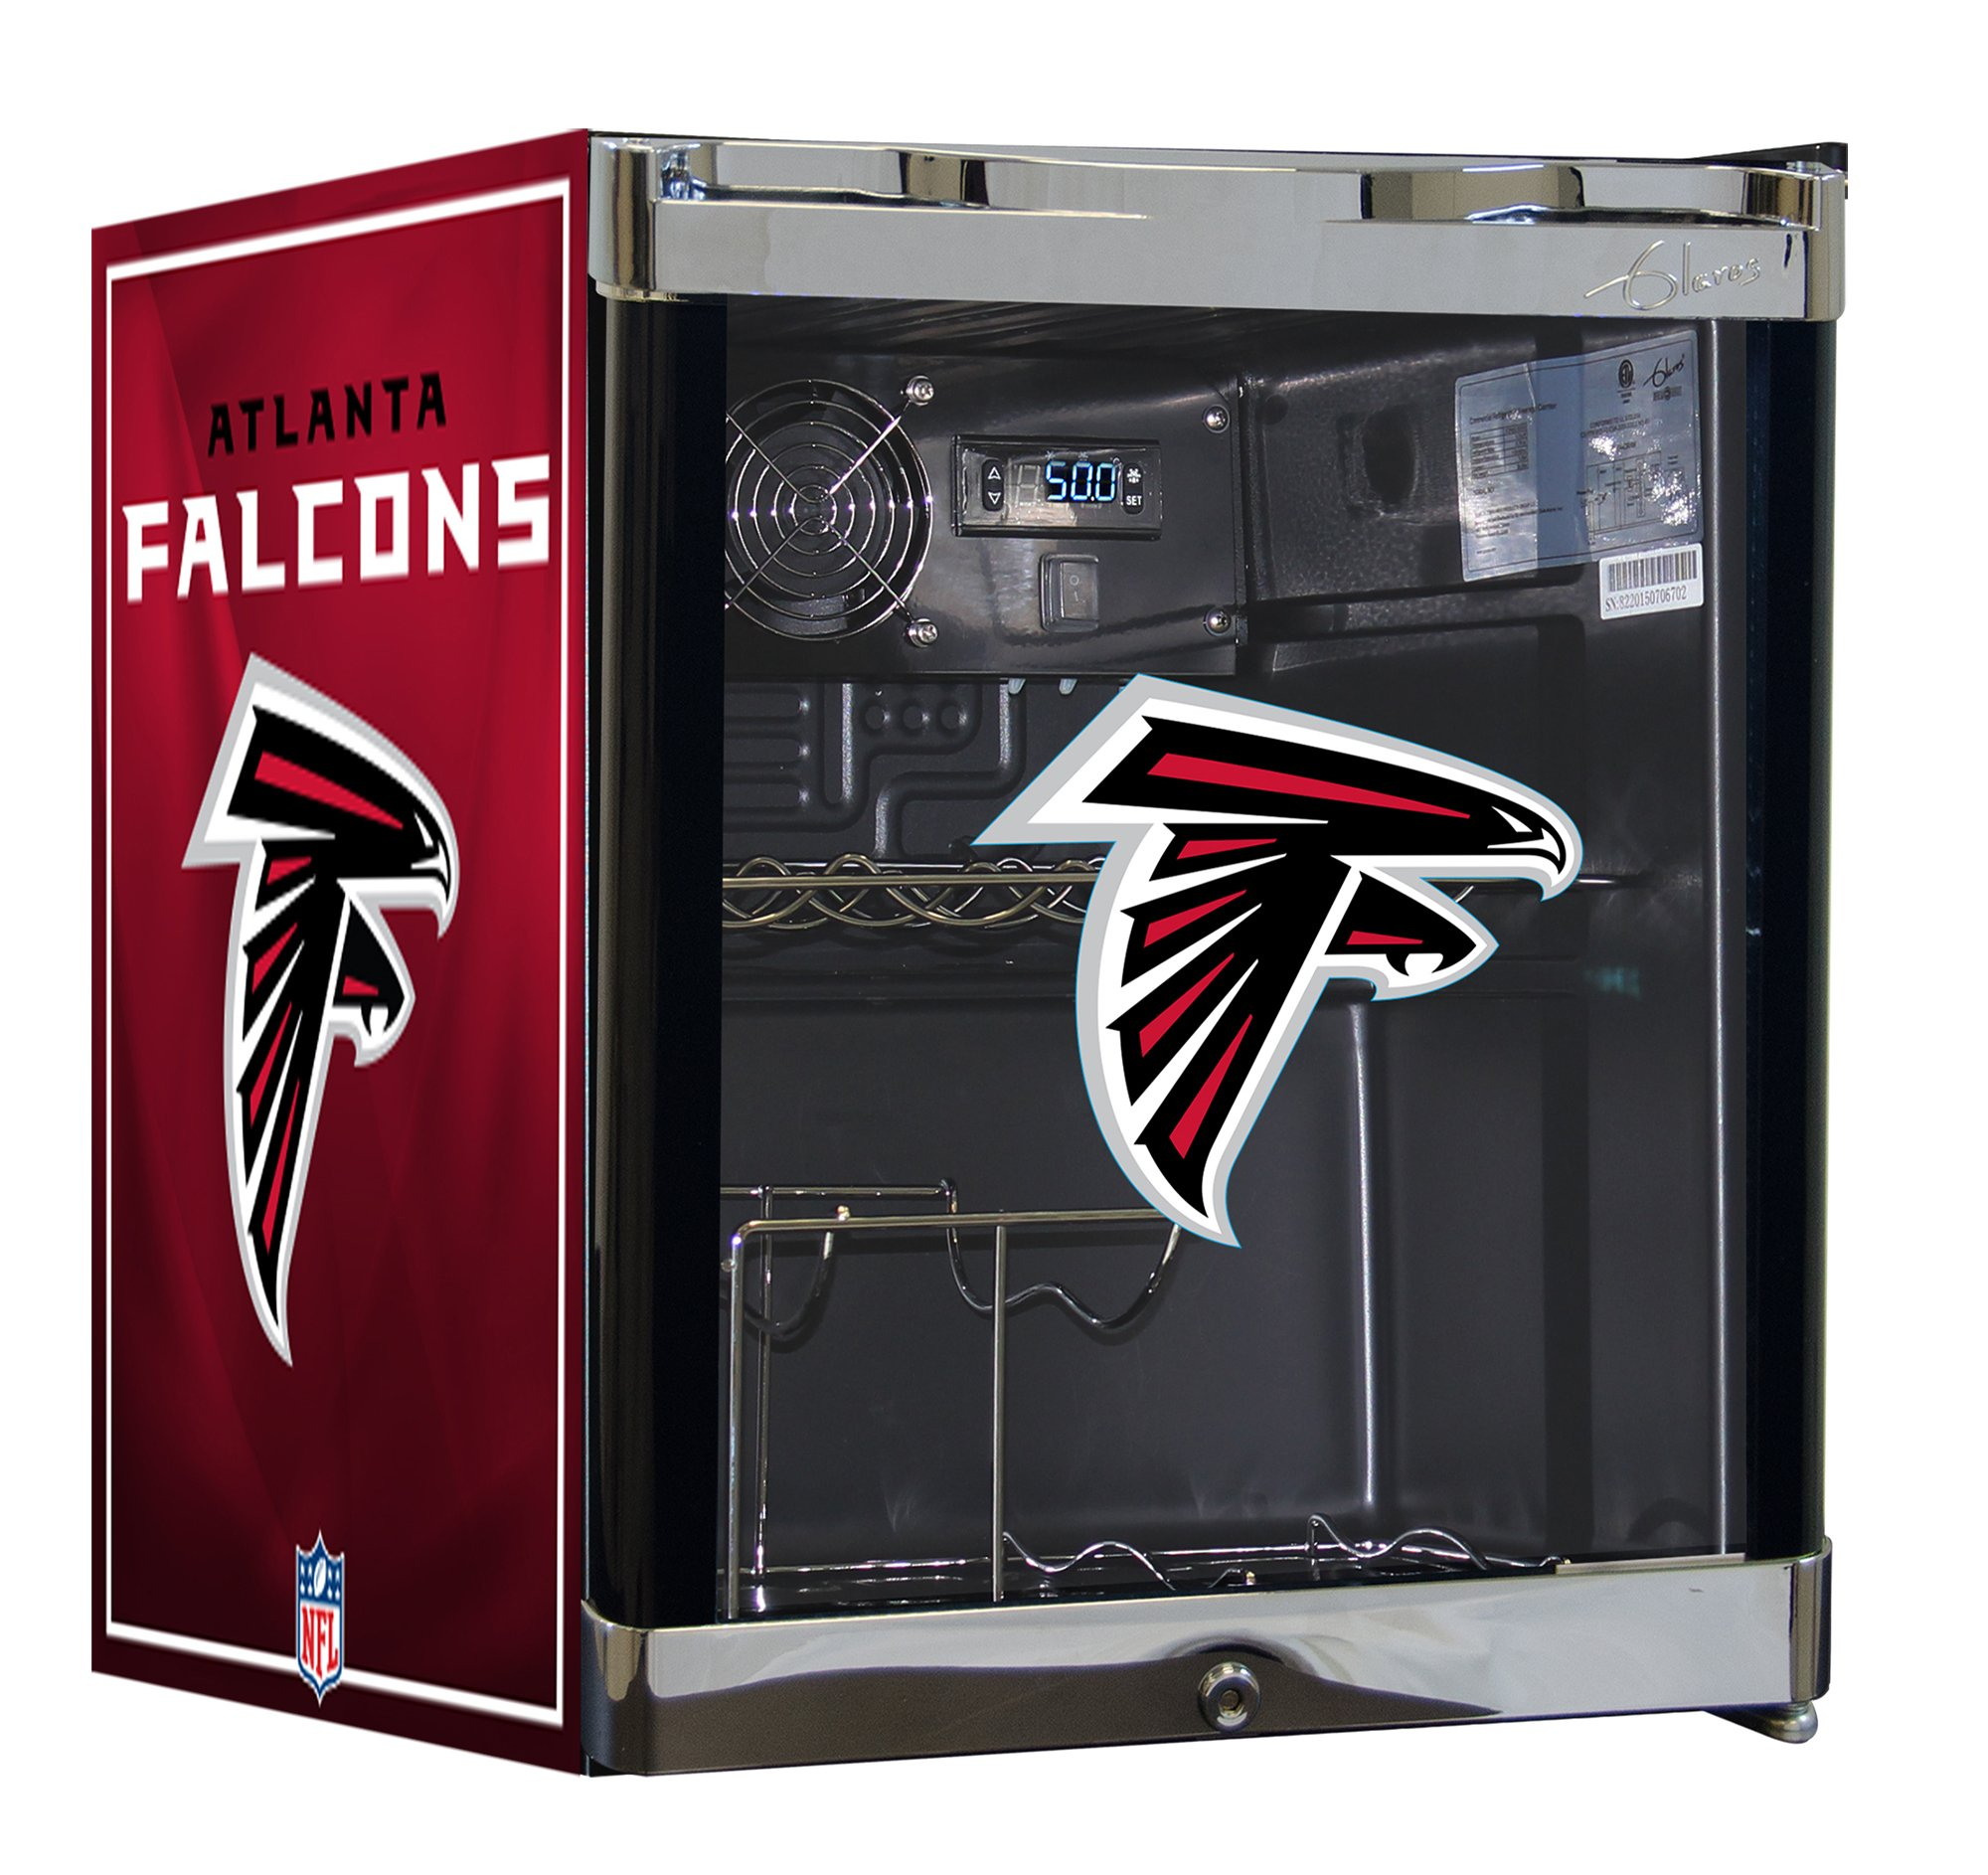 NFL Wine Cooler & Beverage Center Combo - Atlanta Falcons